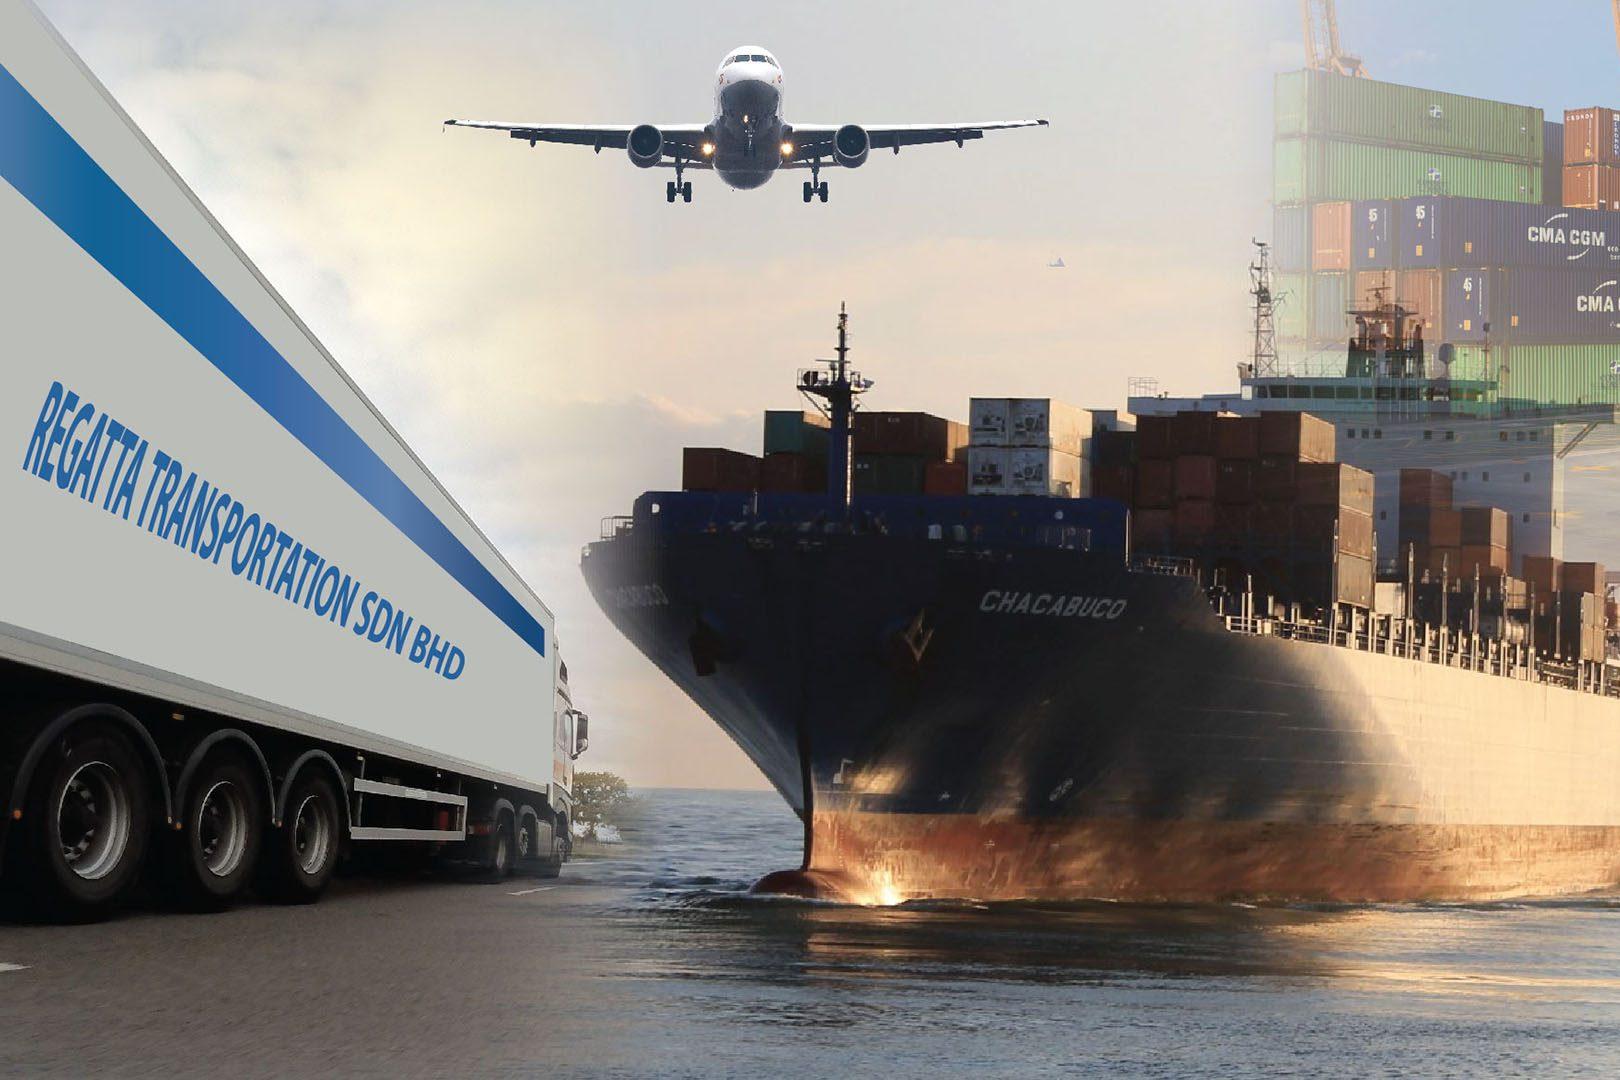 Logistic, shipping, Ipoh, Perak, Malaysia | Regatta Residences Sdn Bhd